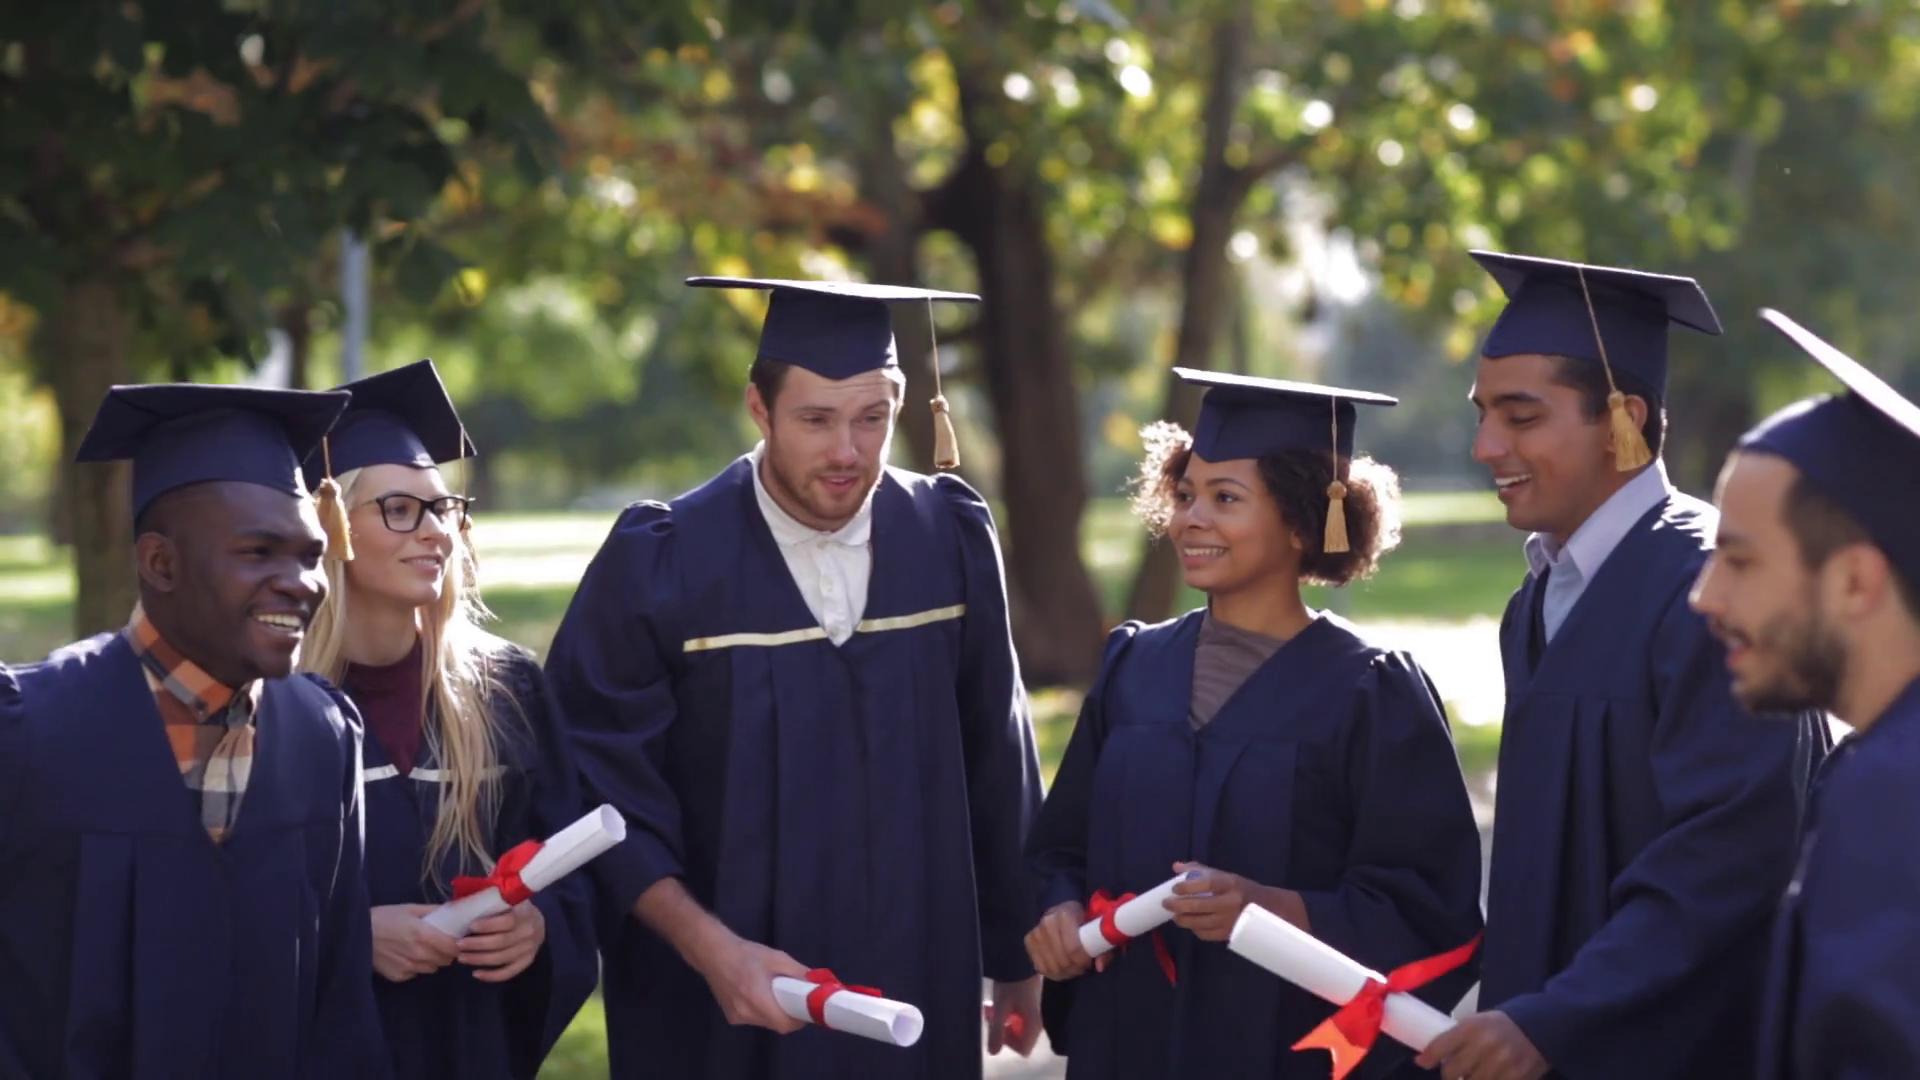 Bachelor of Education (B.Ed) course